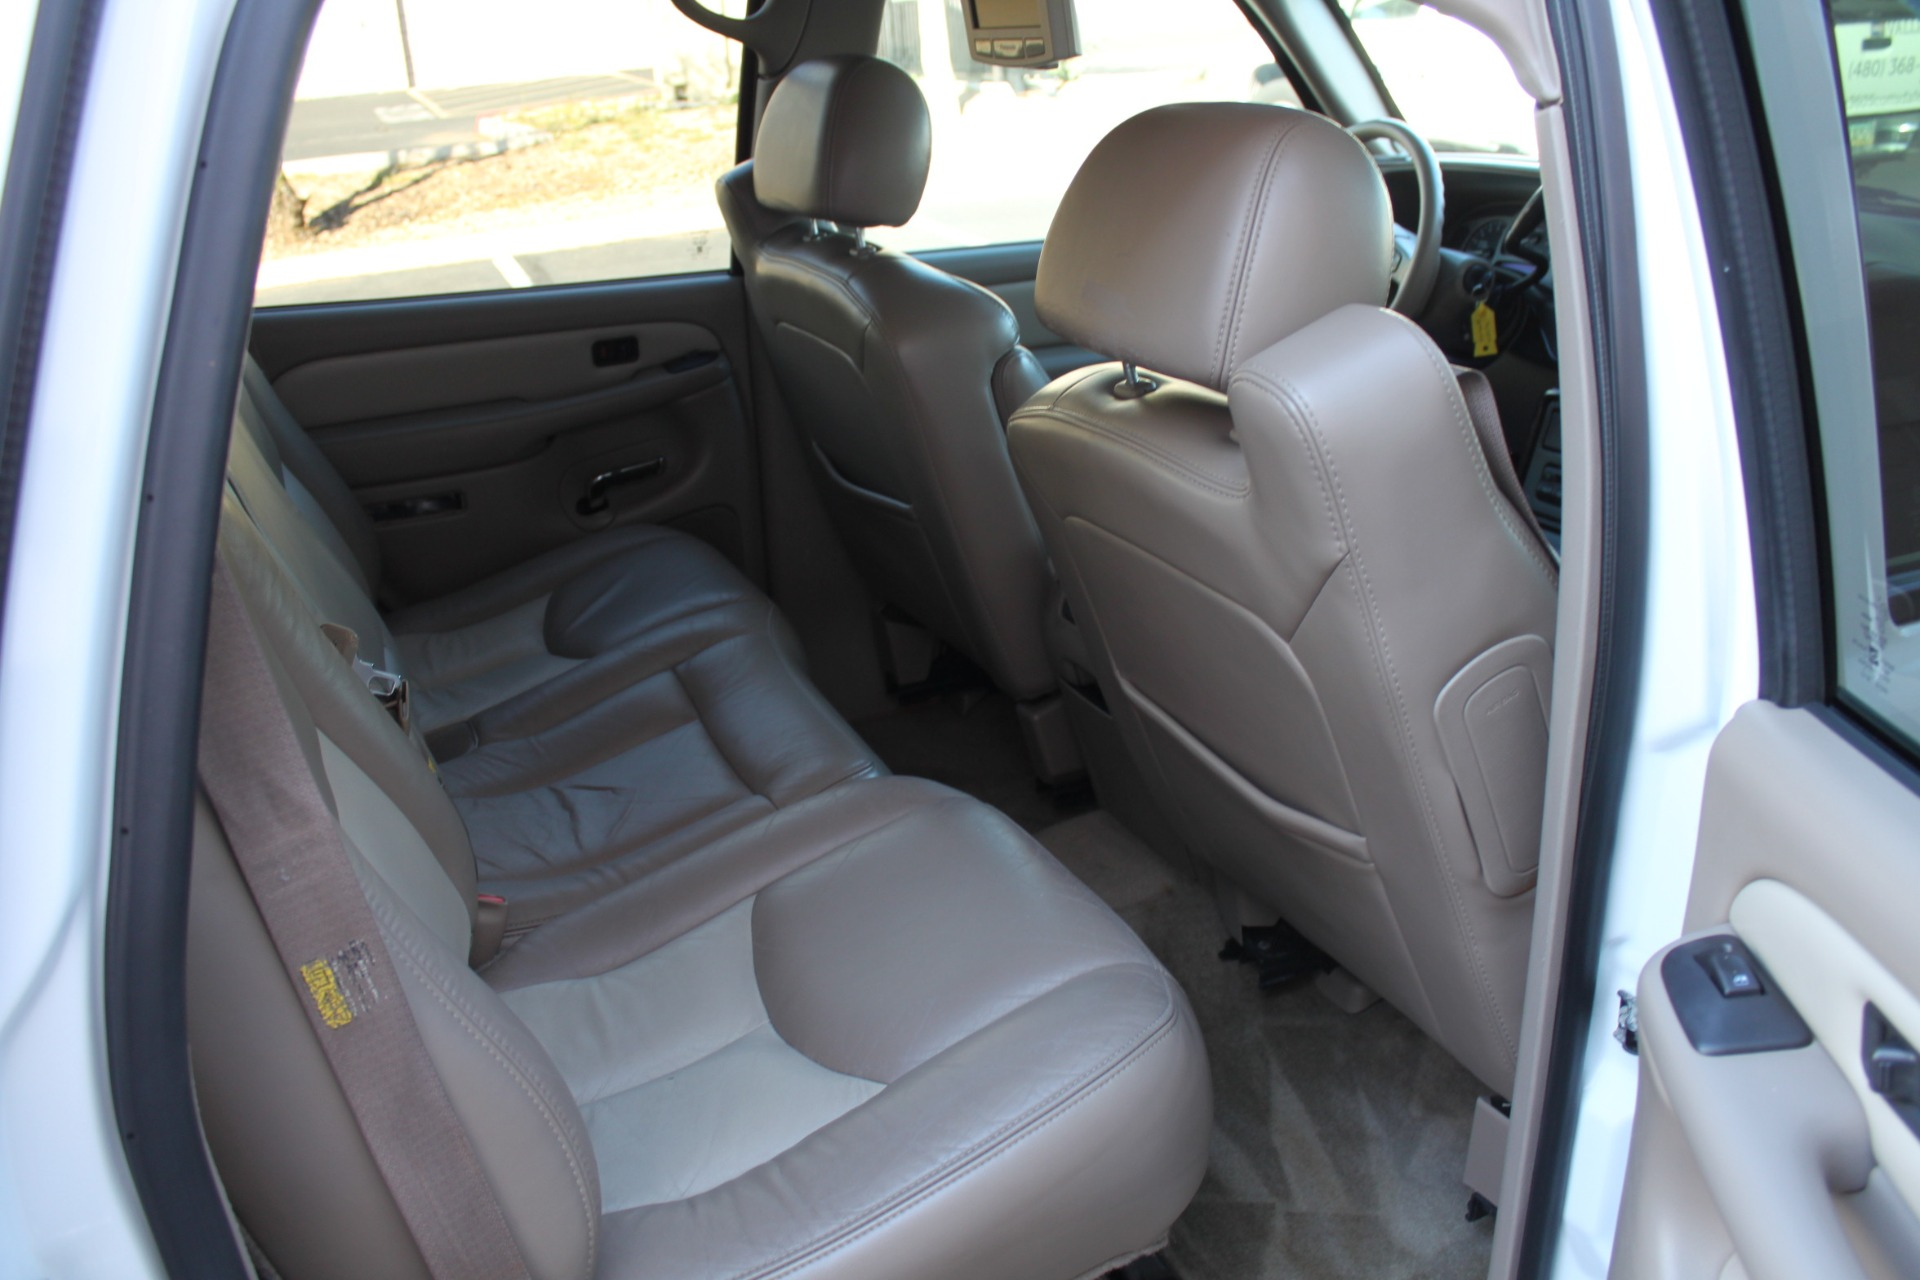 Used-2006-GMC-Yukon-Denali-AWD-Lexus